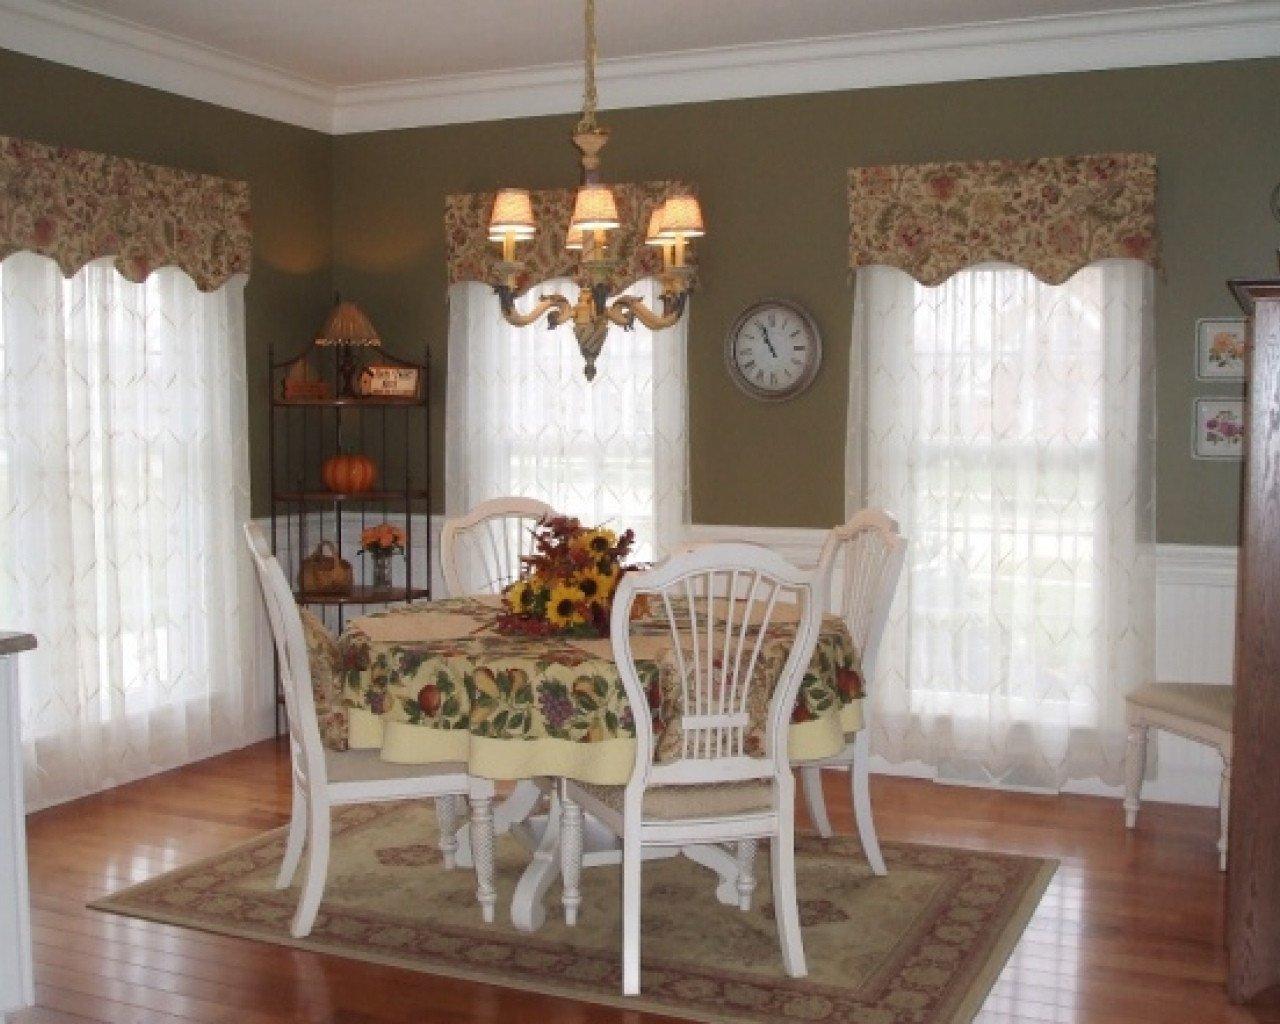 Country Kitchen Wall Decor Ideas Luxury Country Kitchen Decor Ideas